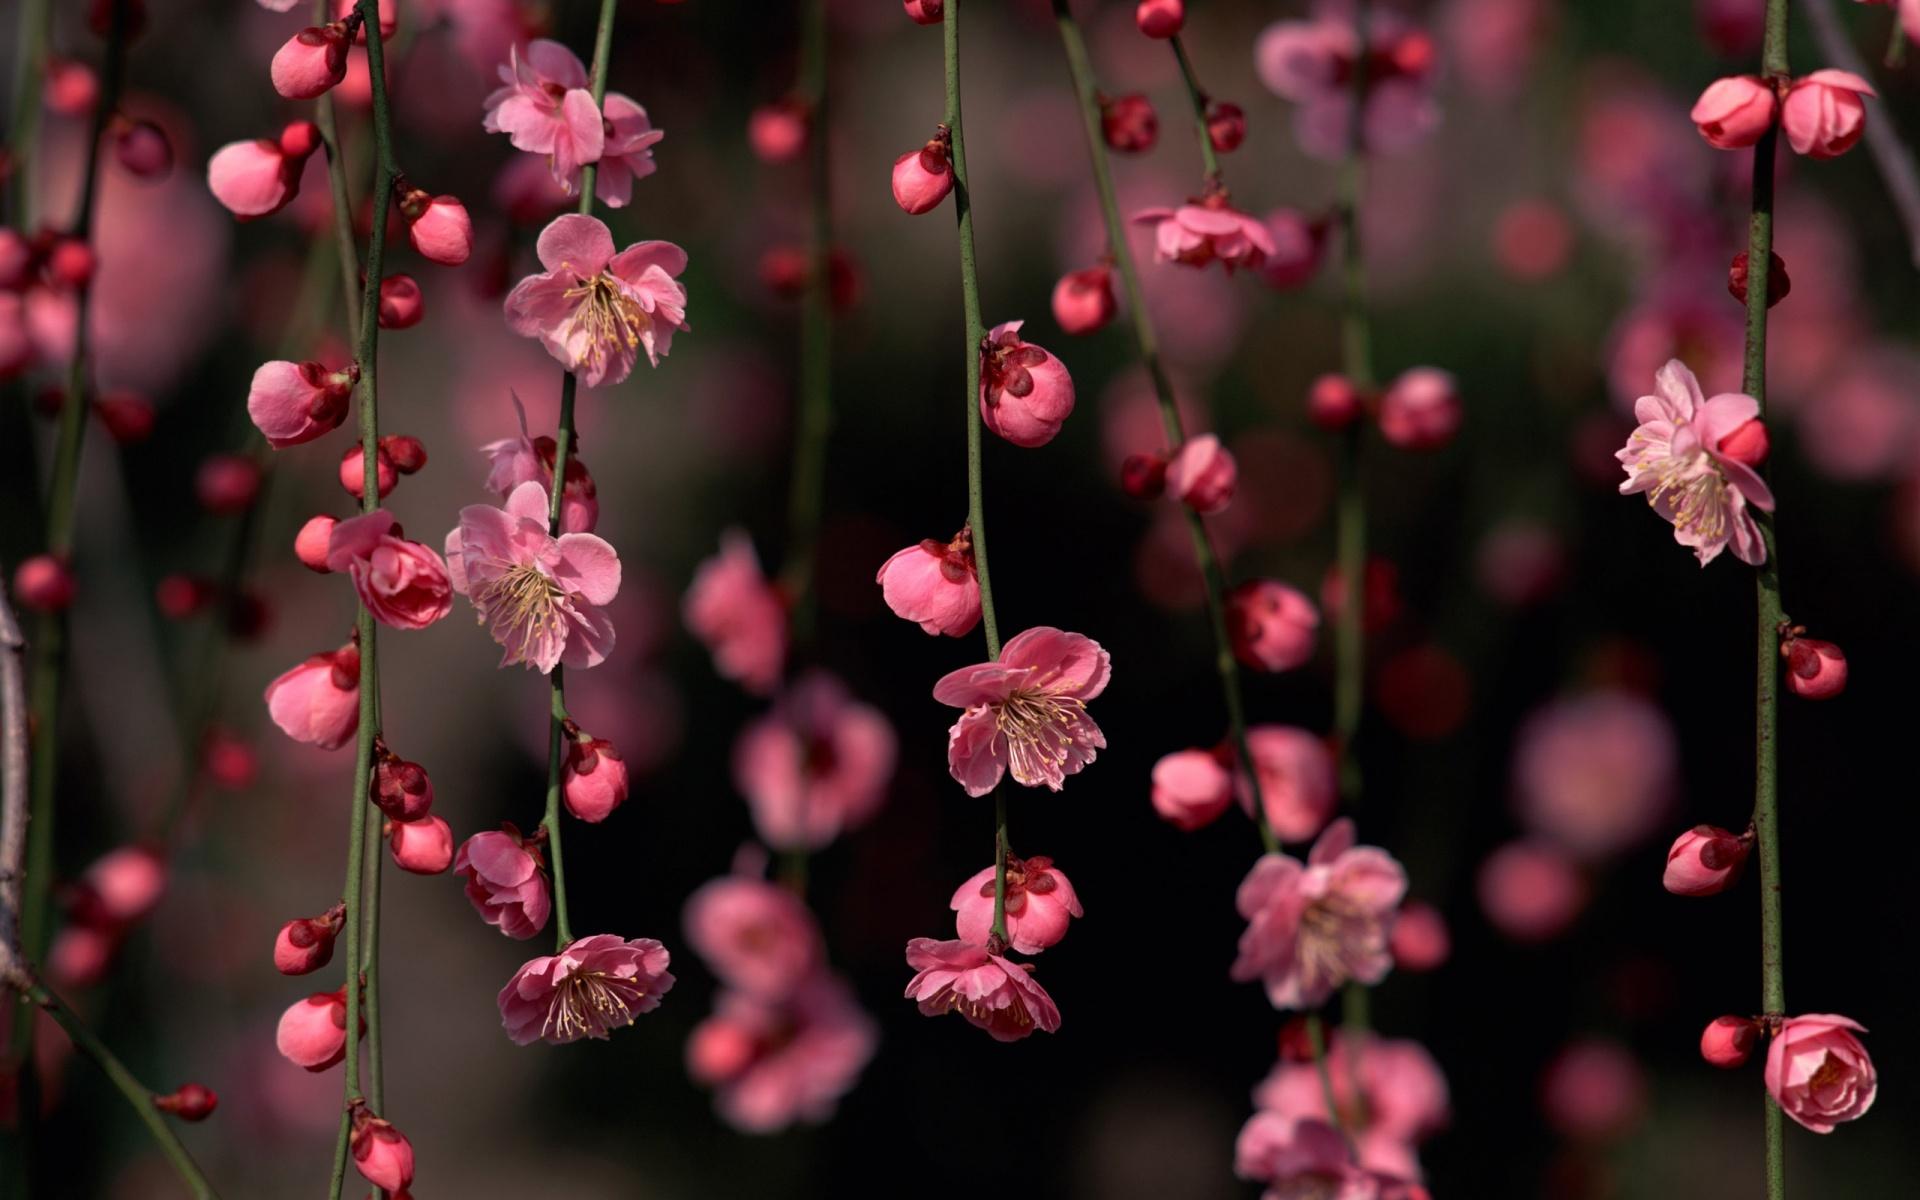 Beautiful Spring Flower   Wallpaper High Definition High Quality 1920x1200